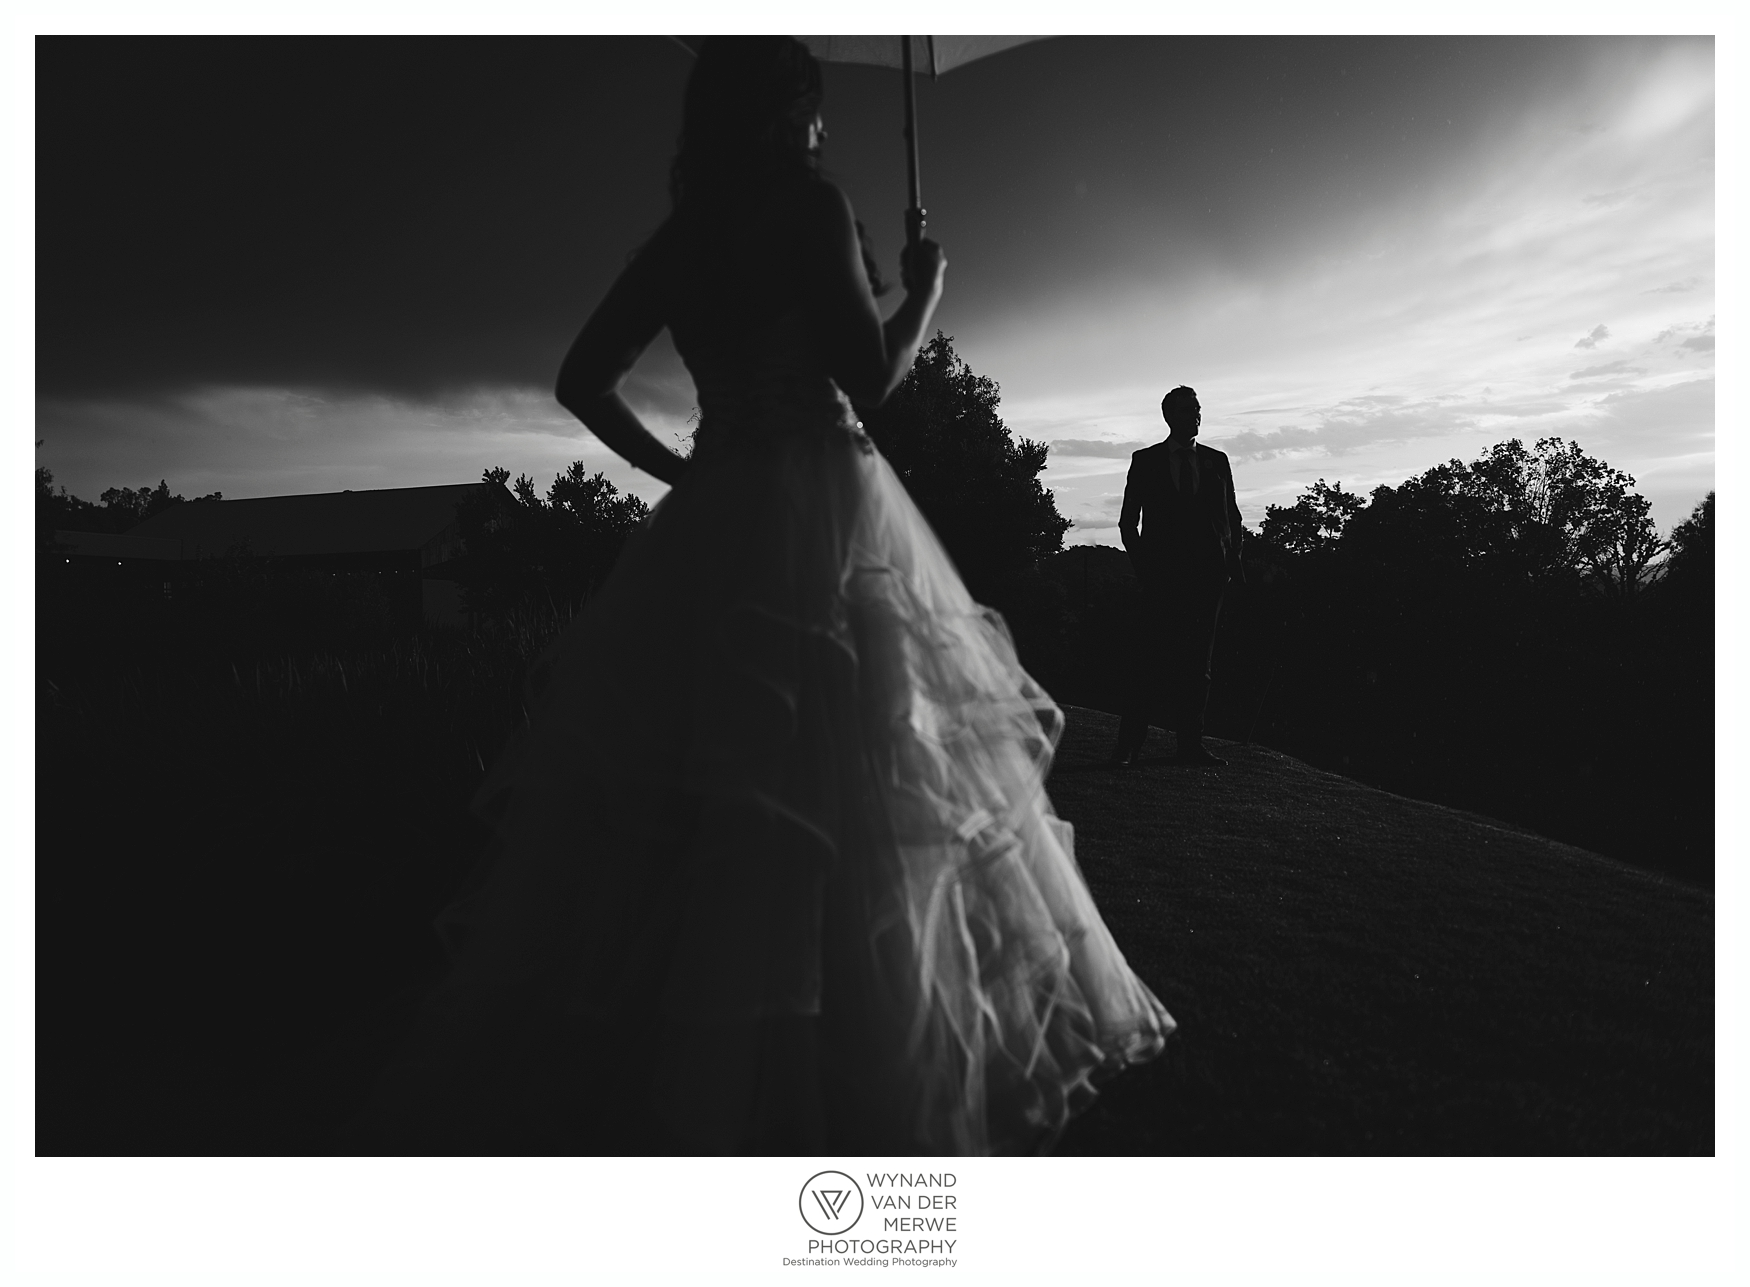 Wynandvandermerwe ryan natalia wedding photography cradle valley guesthouse gauteng-496.jpg